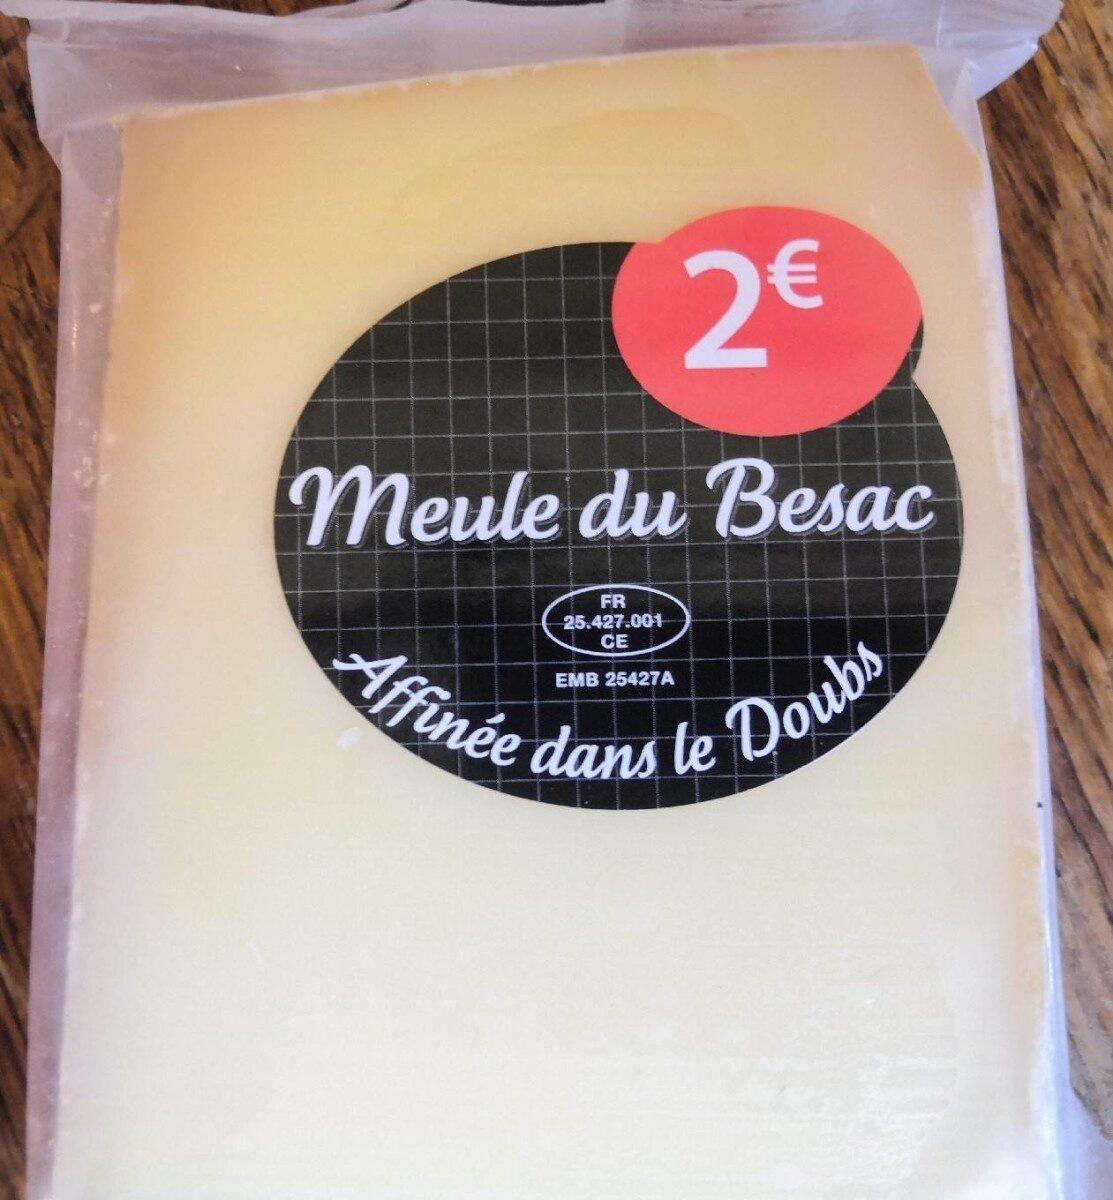 Meule du besac - Prodotto - fr